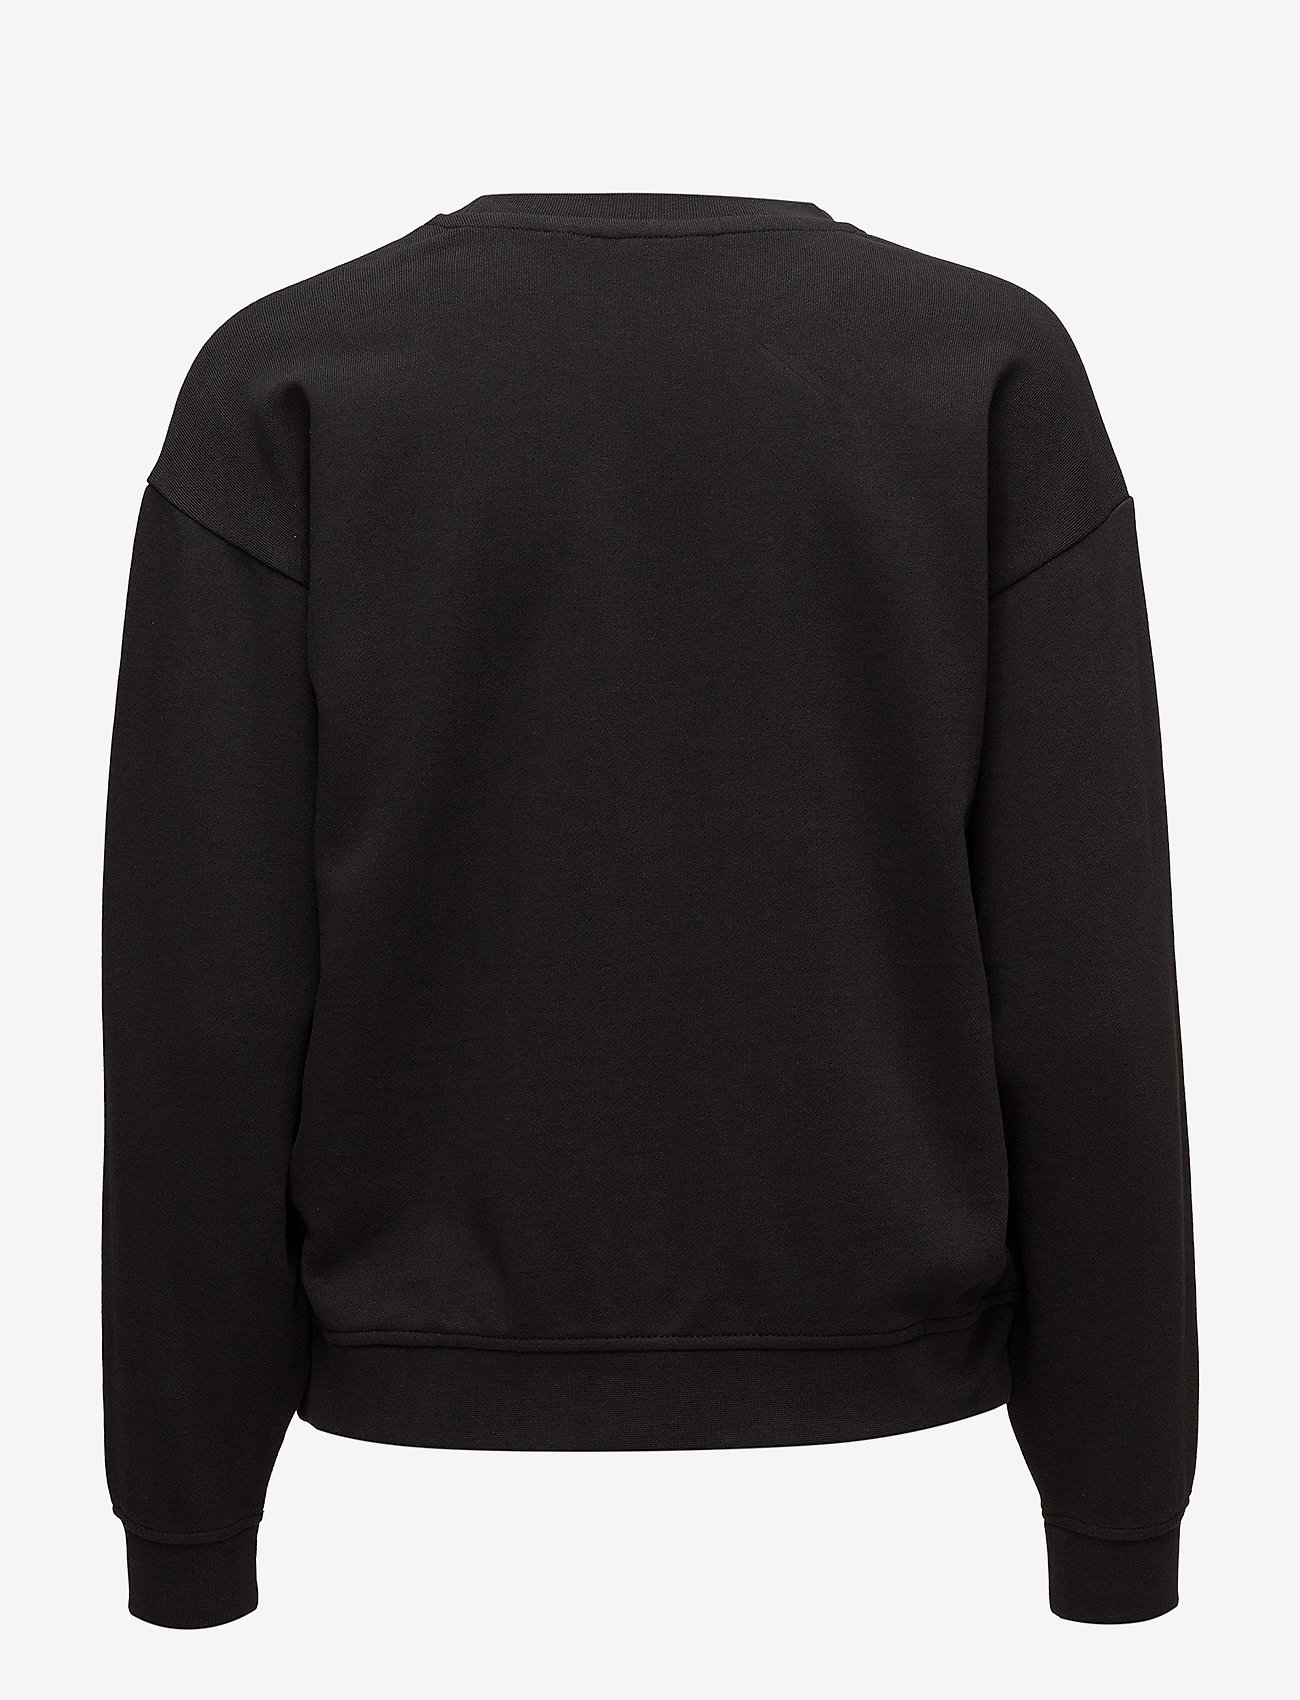 Wrangler Logo Sweat Shirt - Sweatshirts